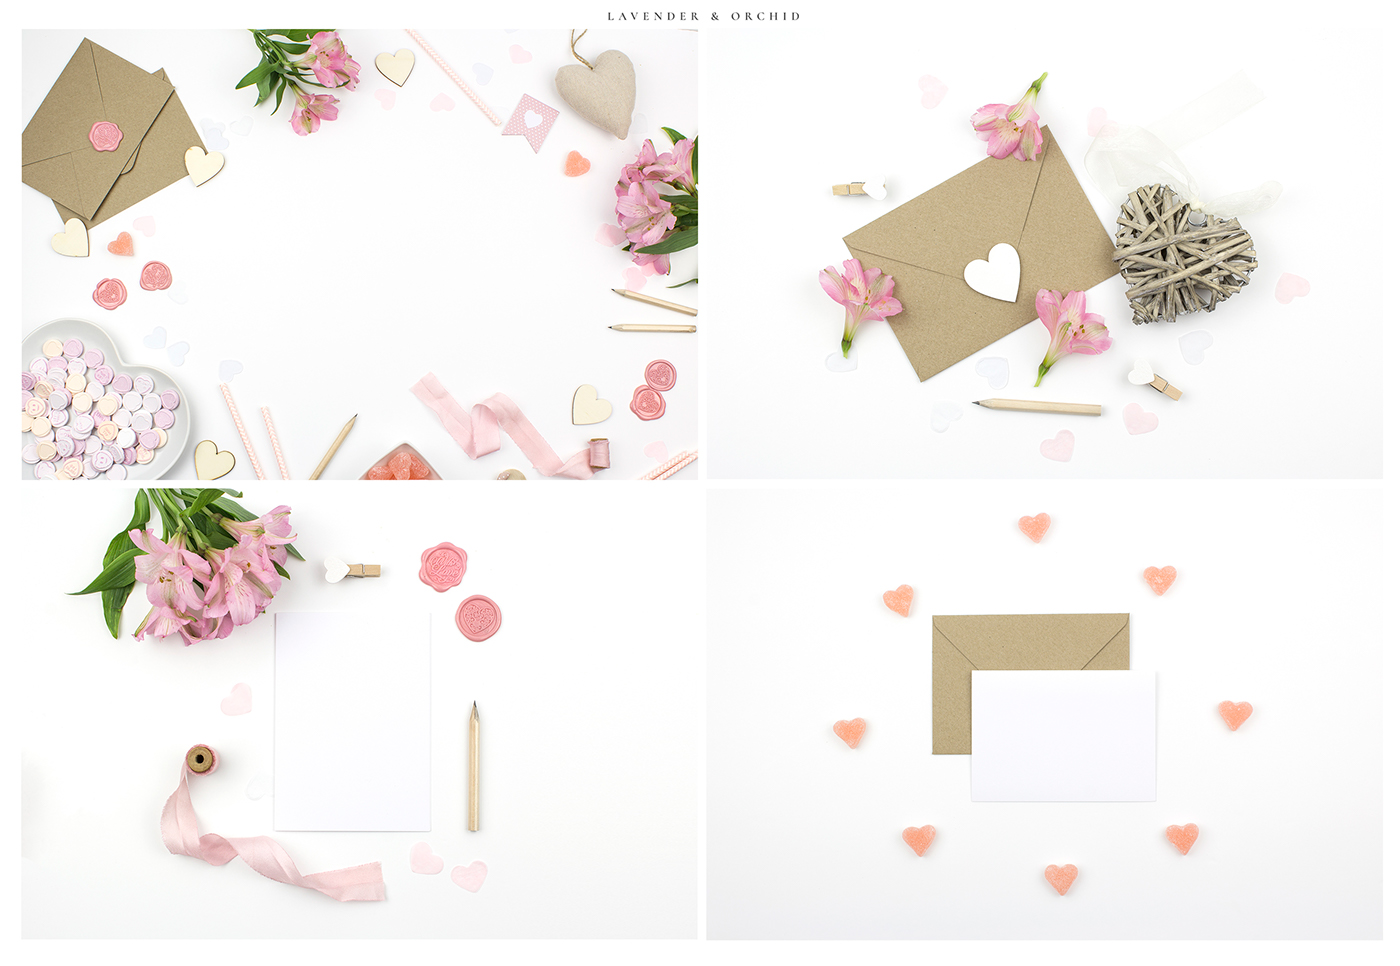 valentines stock photography invitation mockup valentines card mockup stationery mockup romantic card mockup product mockup valentines photo Valentines Card free card mockup